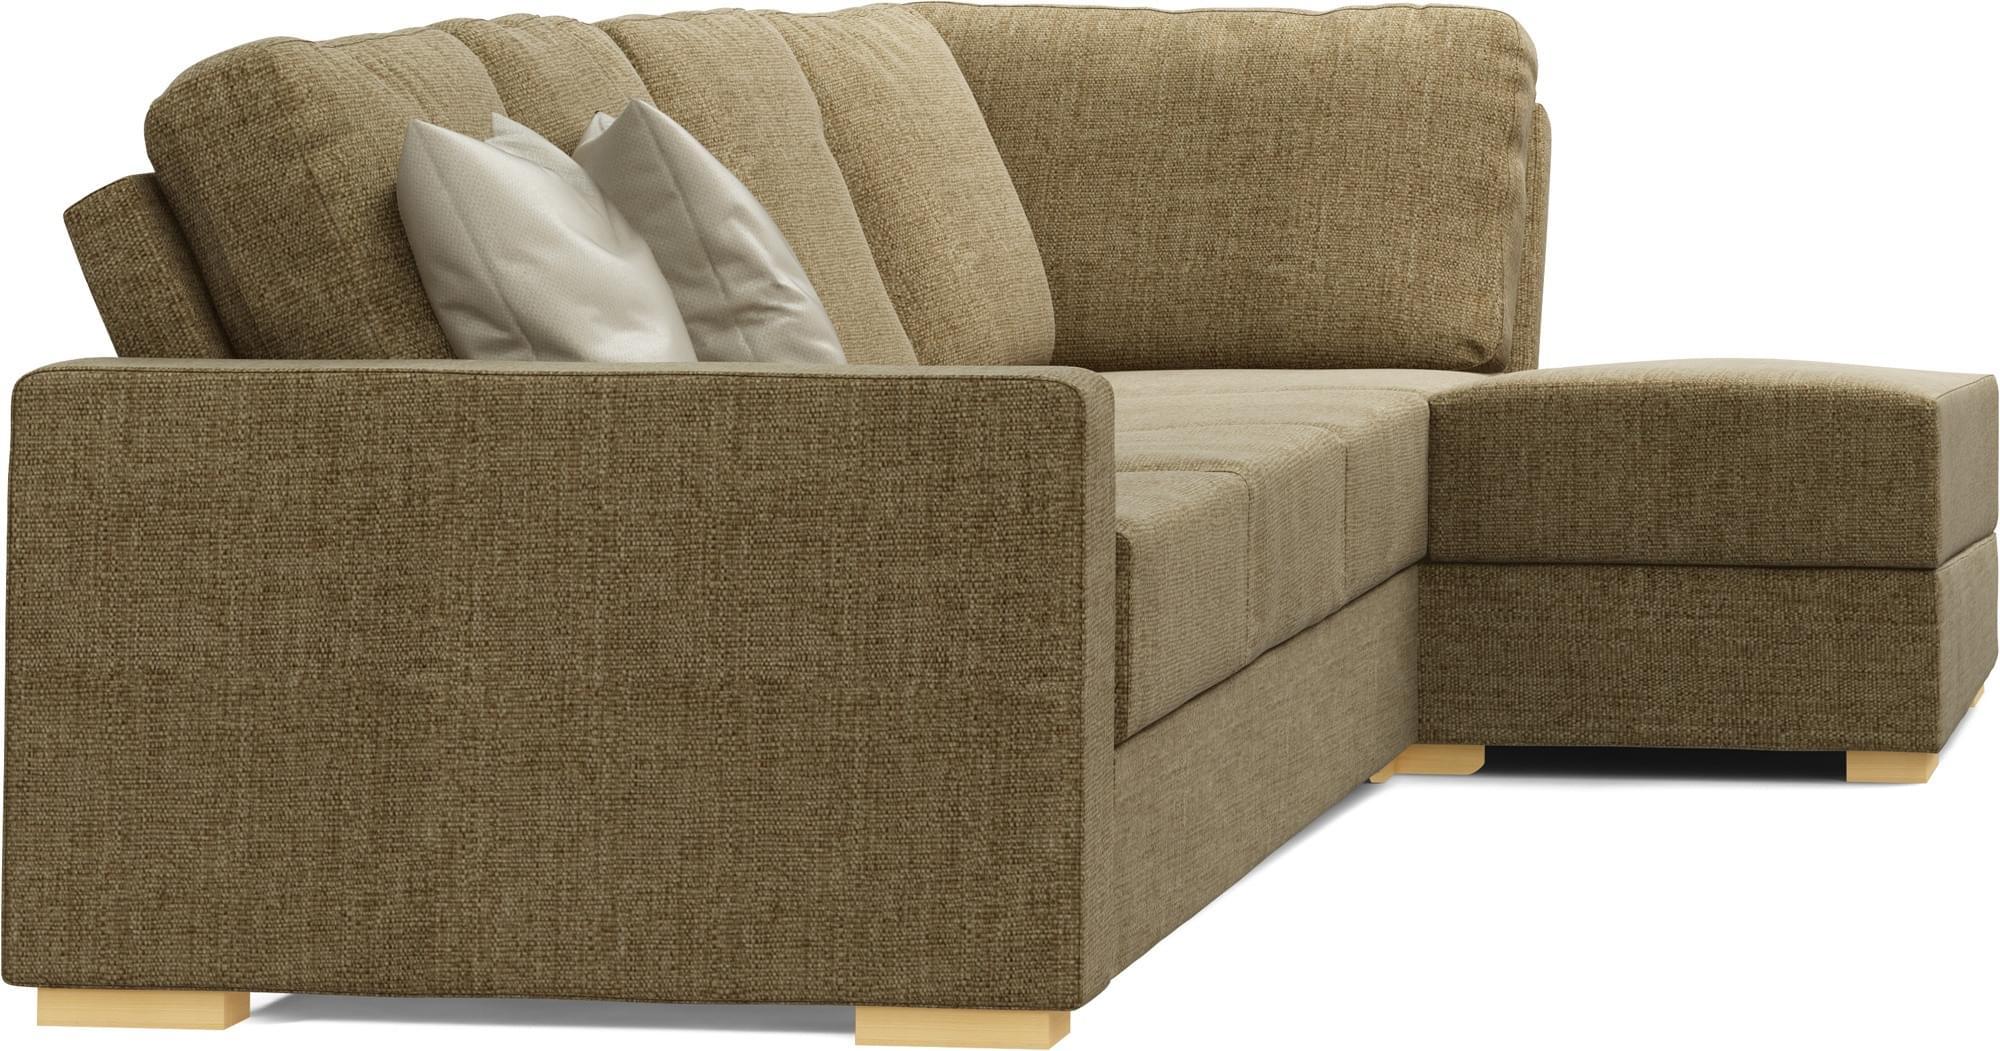 Lear chaise 4x2 corner sofa corner sofas nabru for Barcelona chaise corner sofa